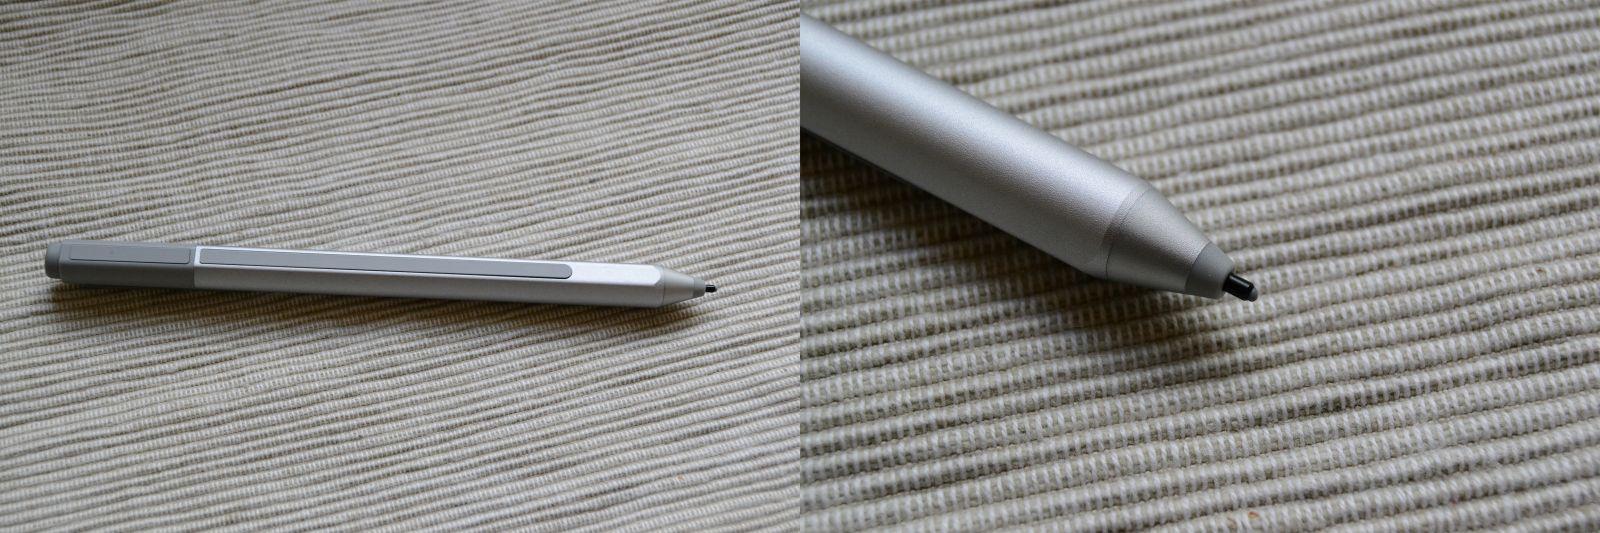 Surface Pro 4 Stylus